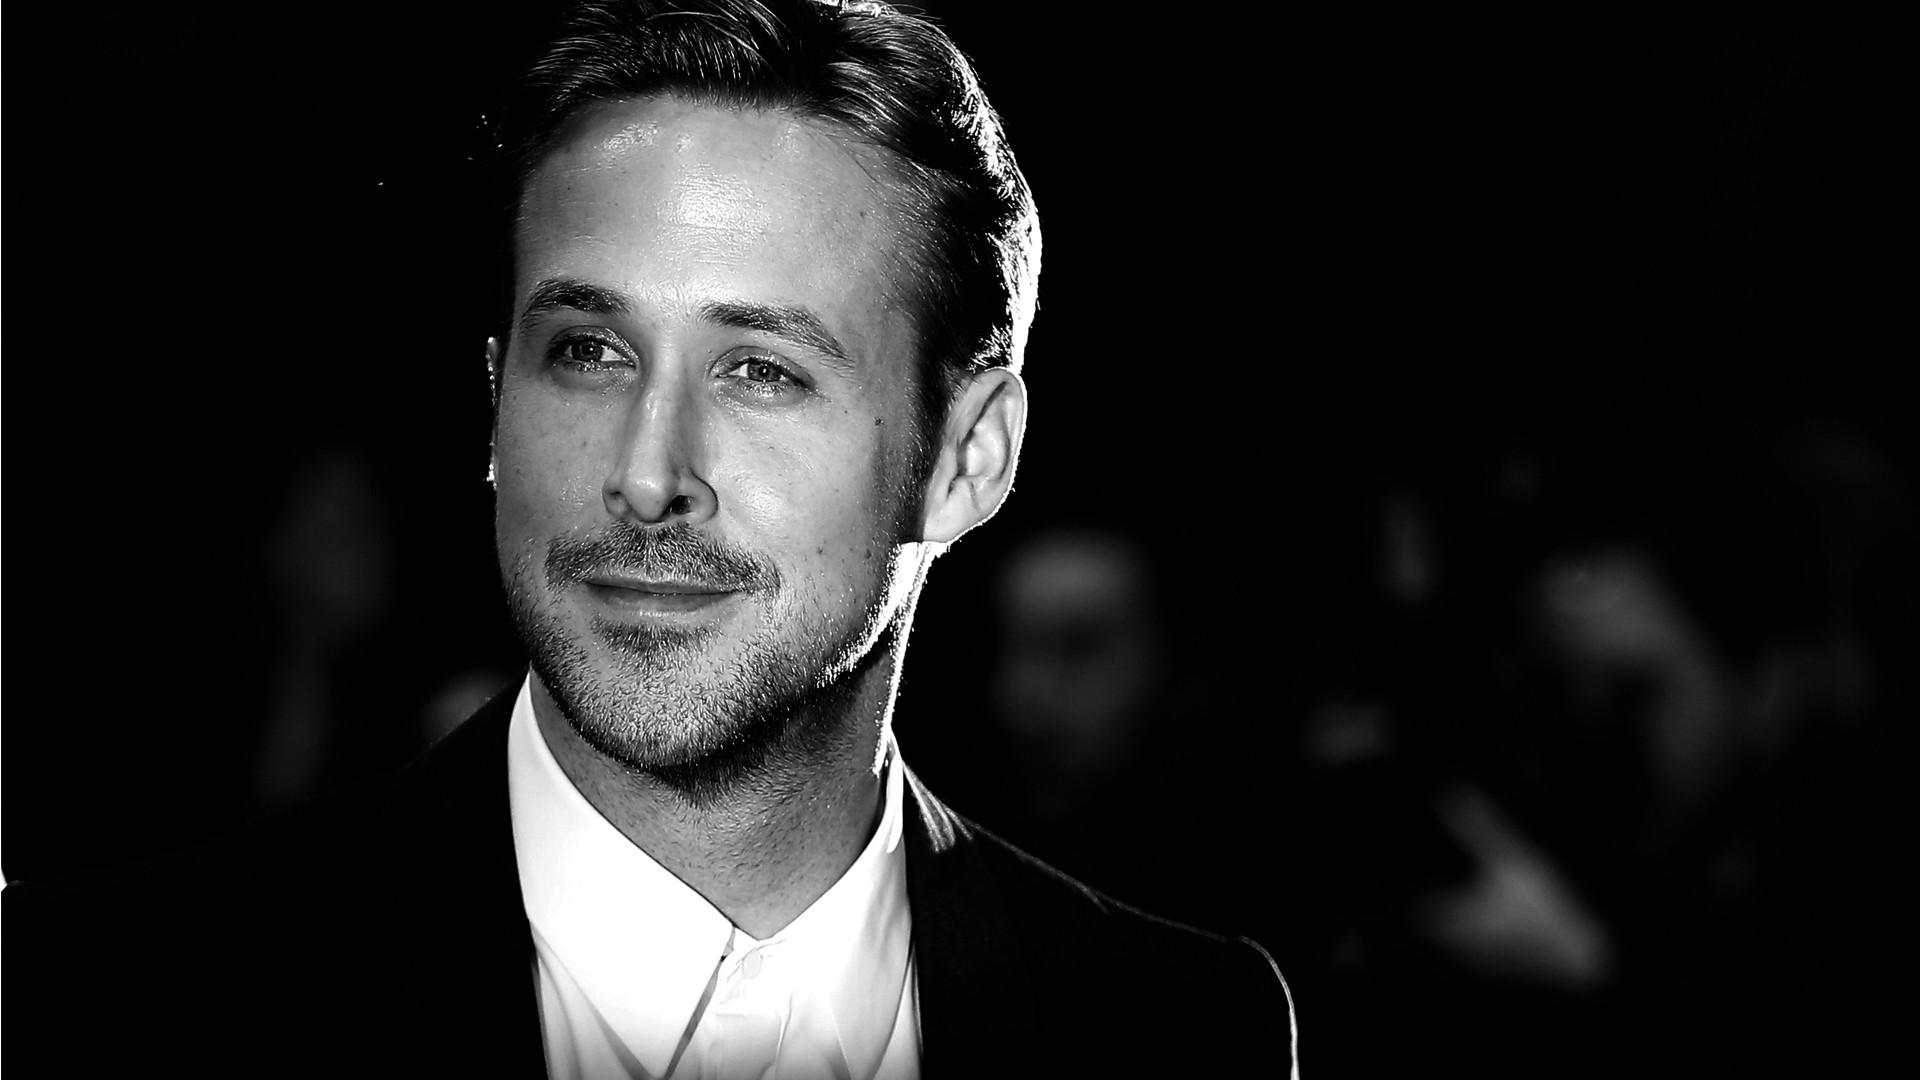 Ryan Gosling HD Wallpapers